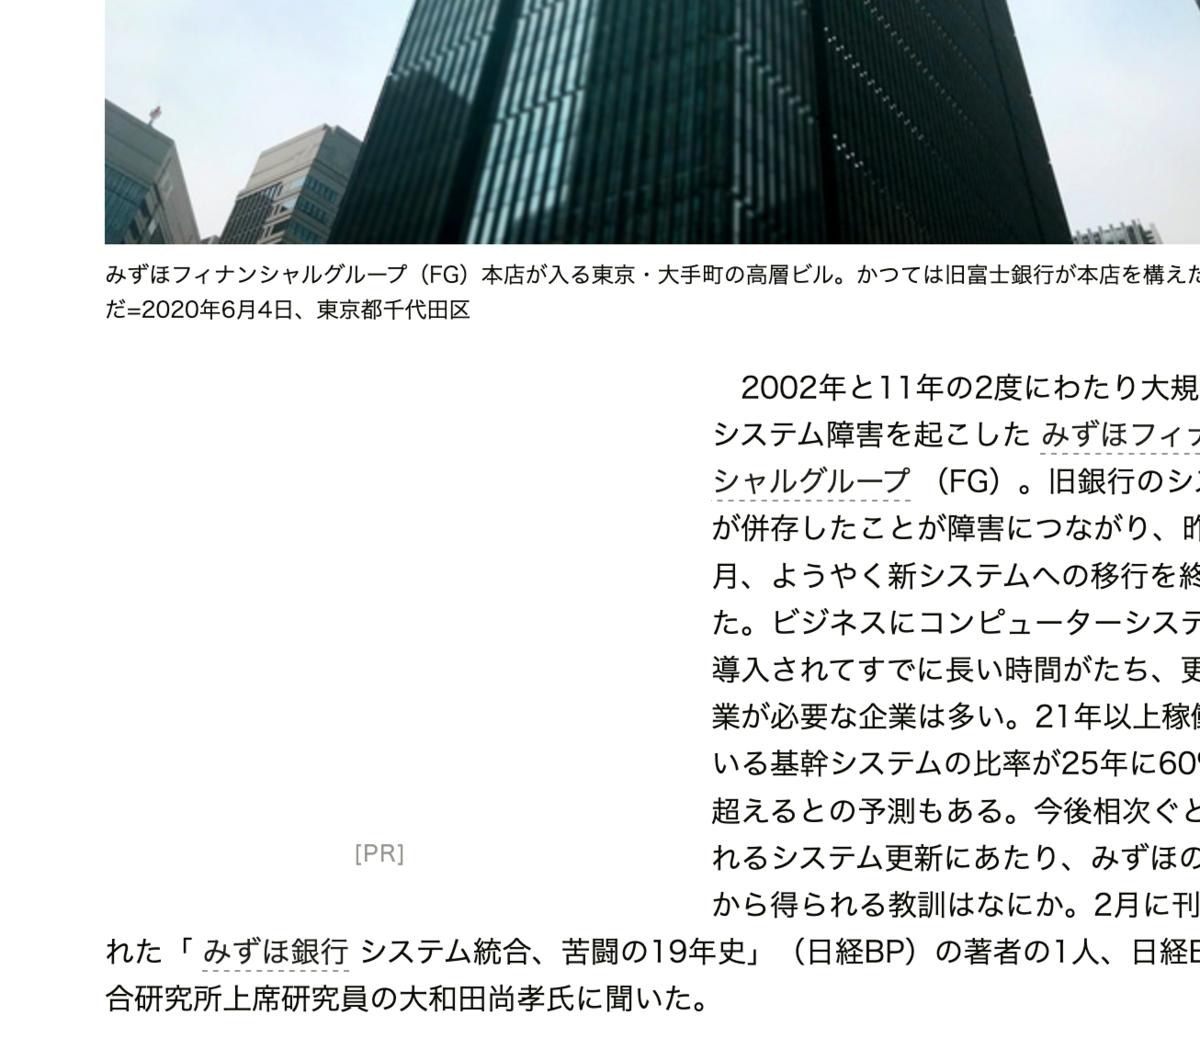 f:id:kuenishi:20200606110345p:plain